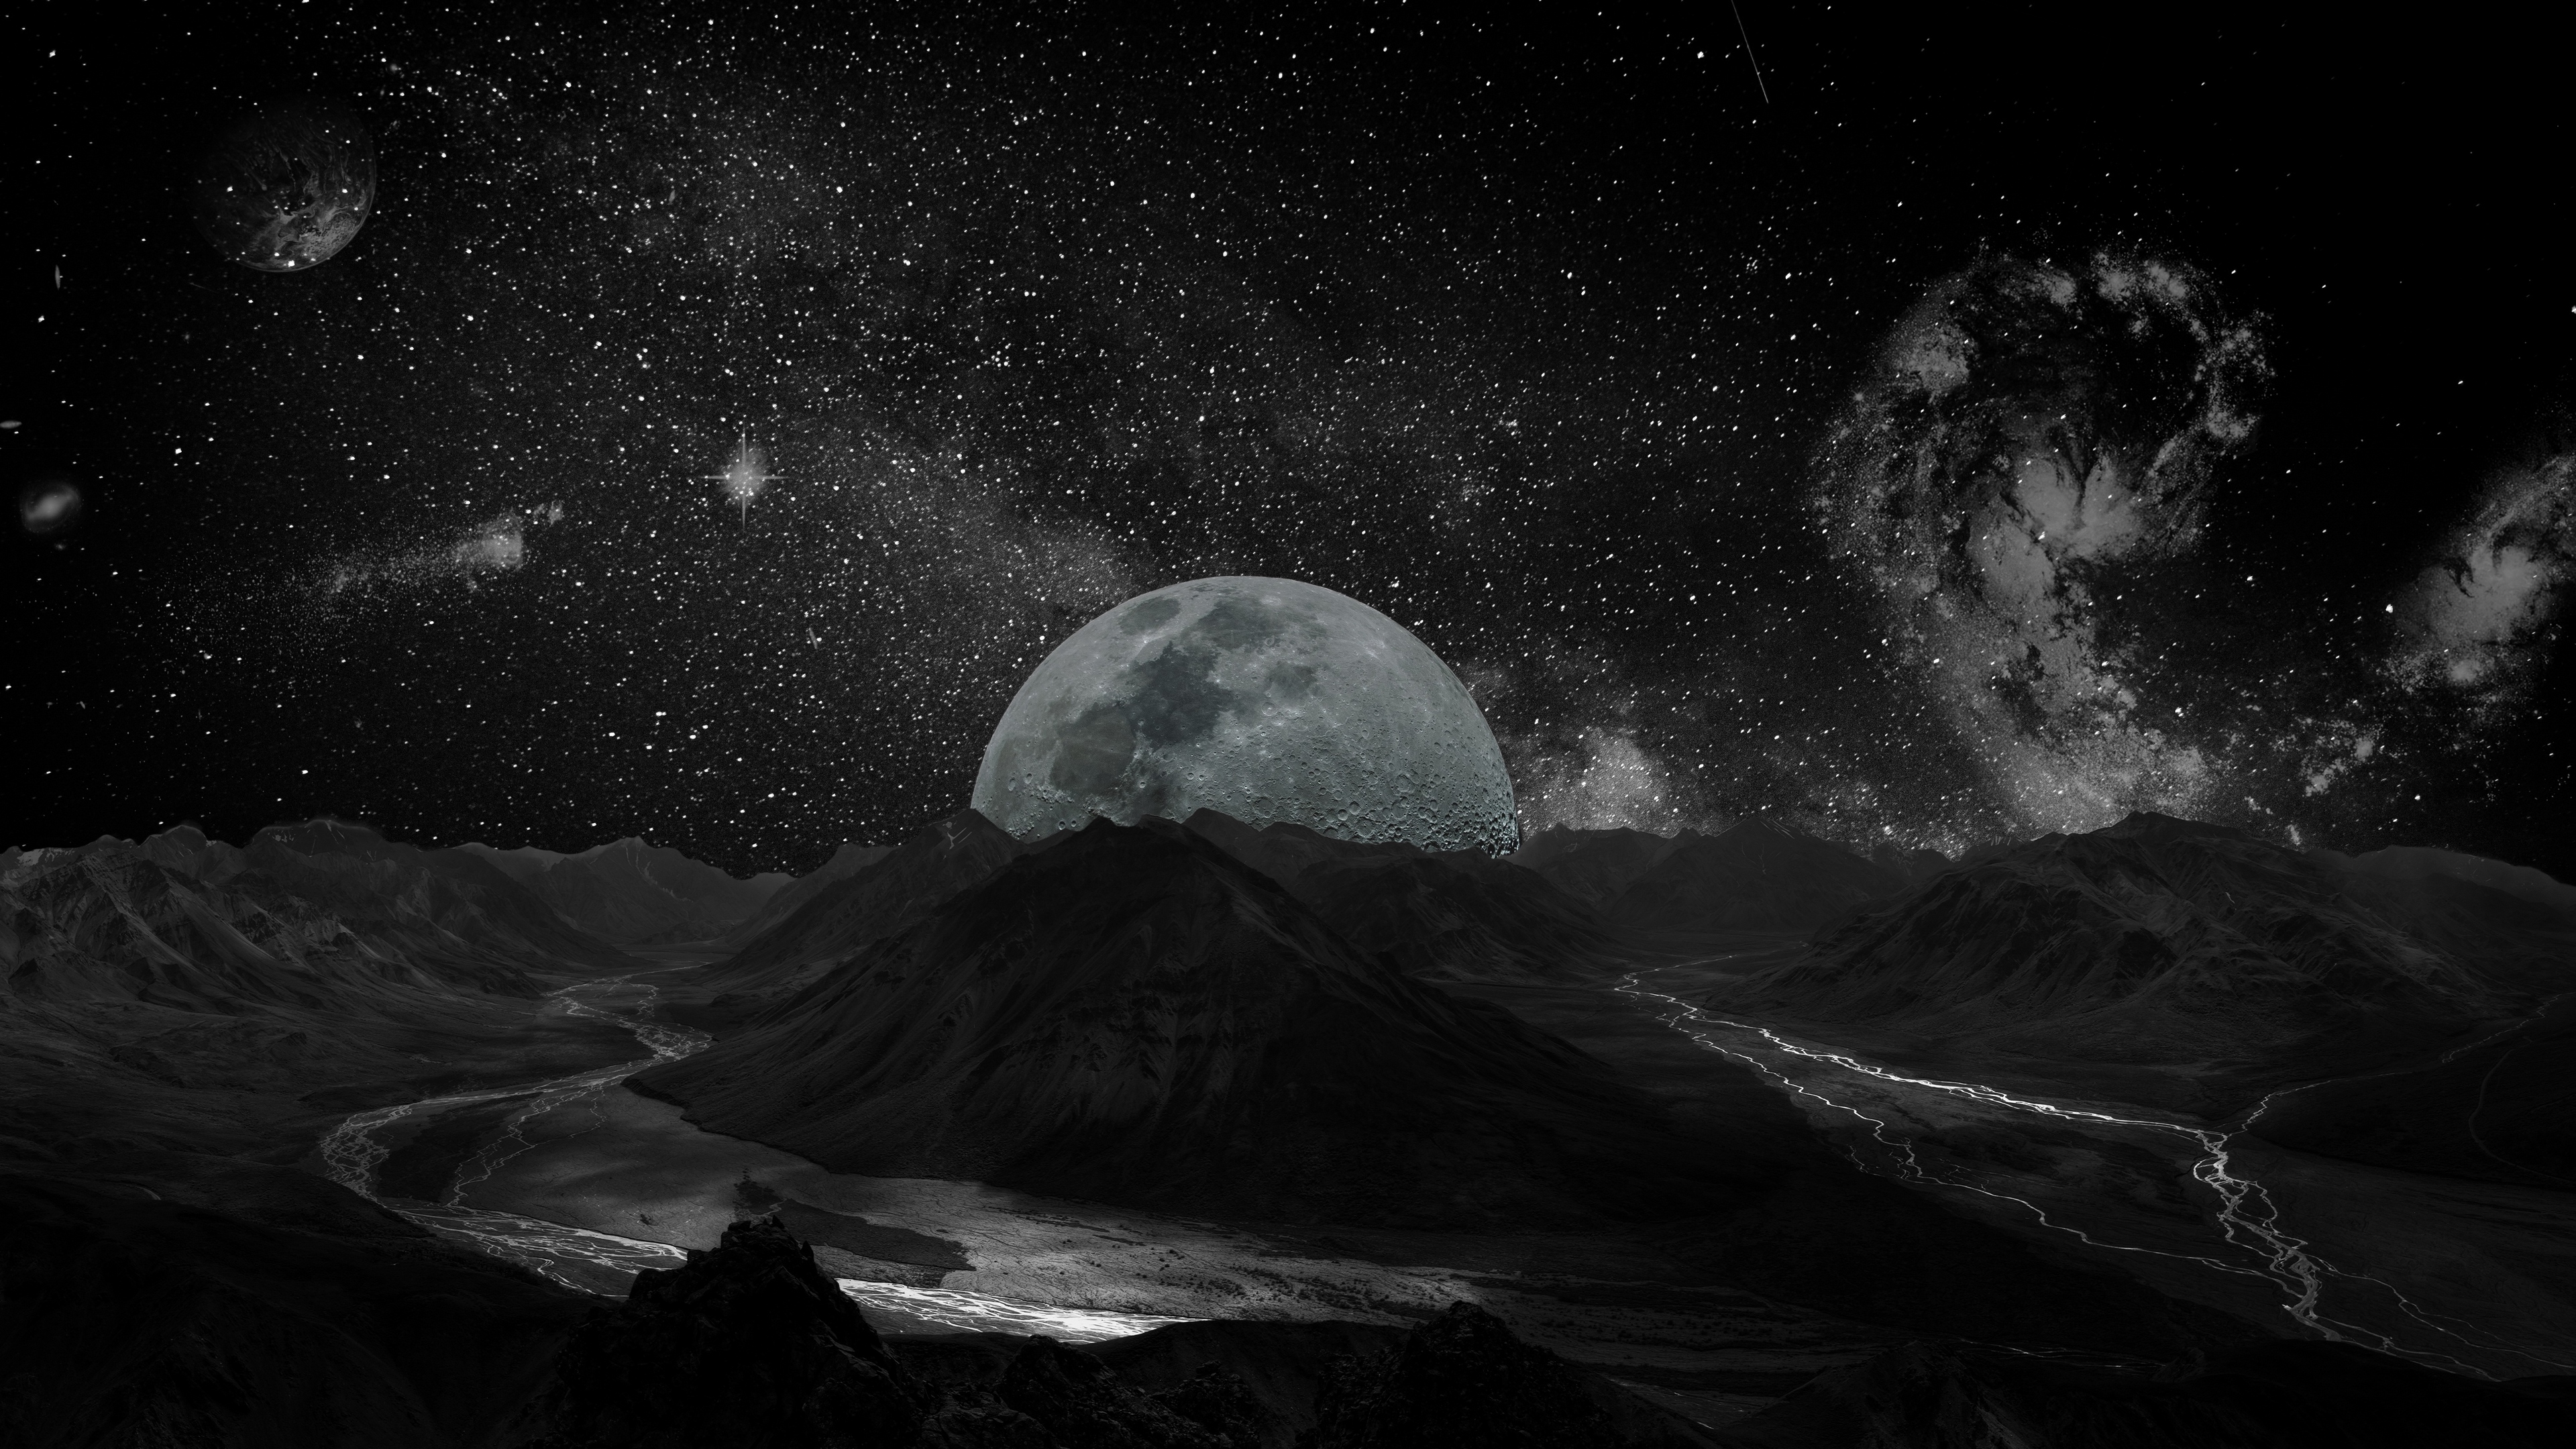 moon planet stars galaxy space 4k 1536016998 - moon, planet, stars, galaxy, space 4k - Stars, Planet, Moon